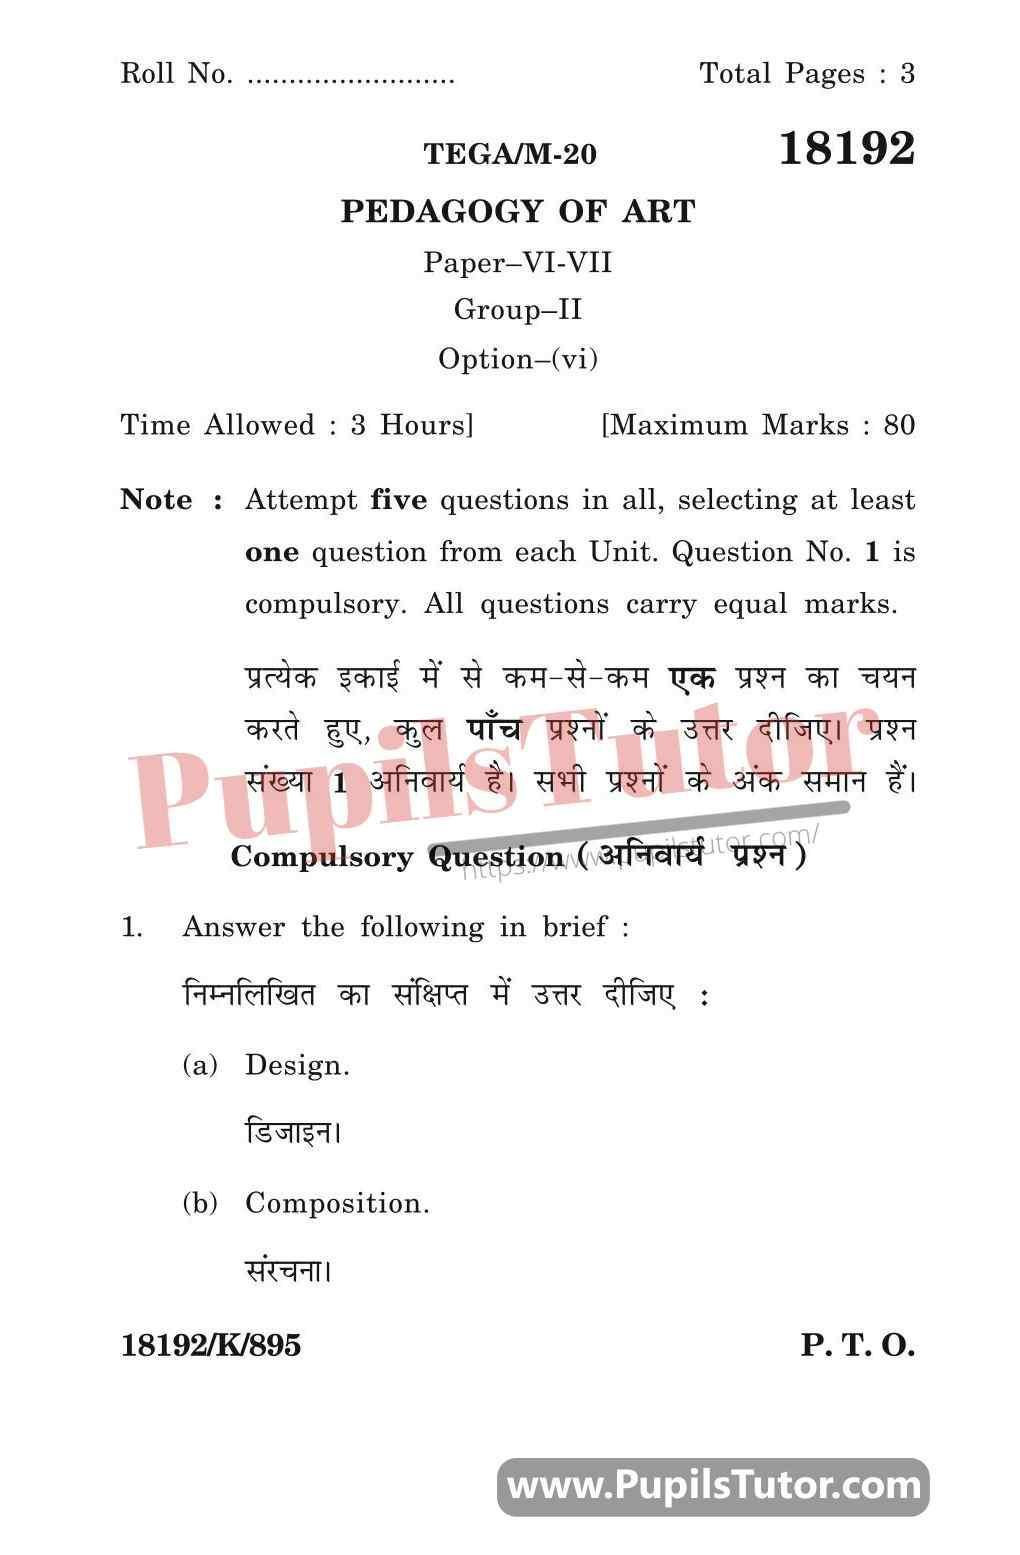 KUK (Kurukshetra University, Haryana) Pedagogy Of Art Question Paper 2020 For B.Ed 1st And 2nd Year And All The 4 Semesters In English And Hindi Medium Free Download PDF - Page 1 - Pupils Tutor